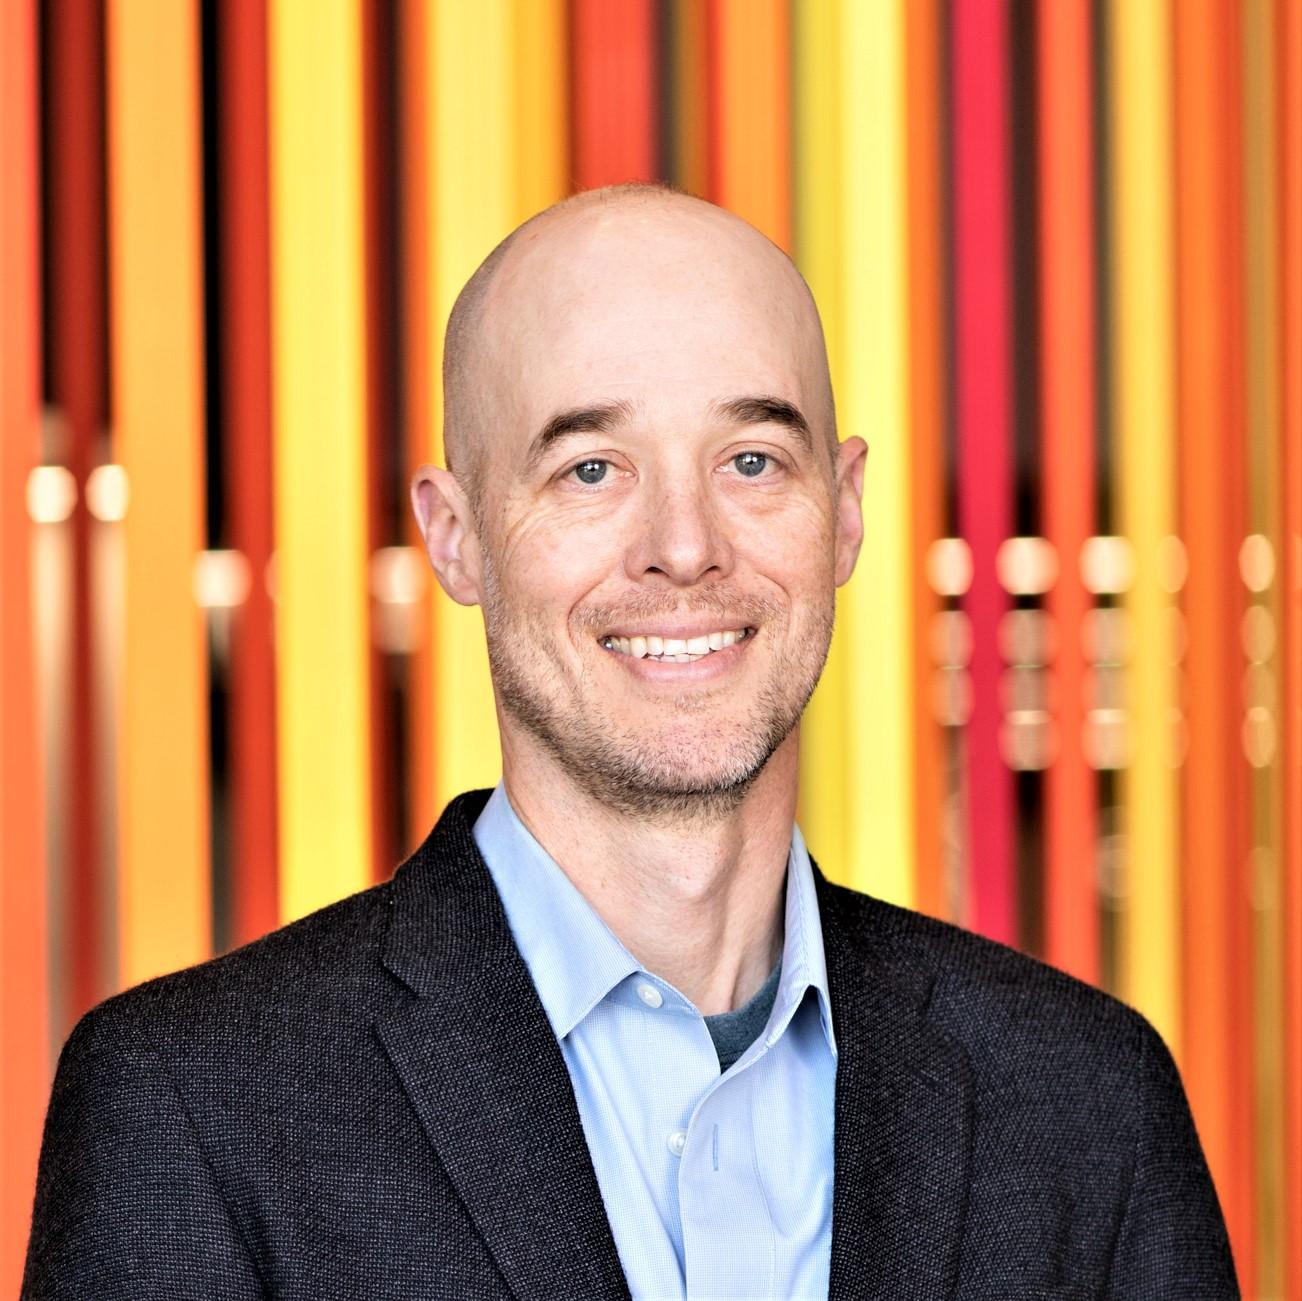 Associate Professor Kyle Lee Hoehn